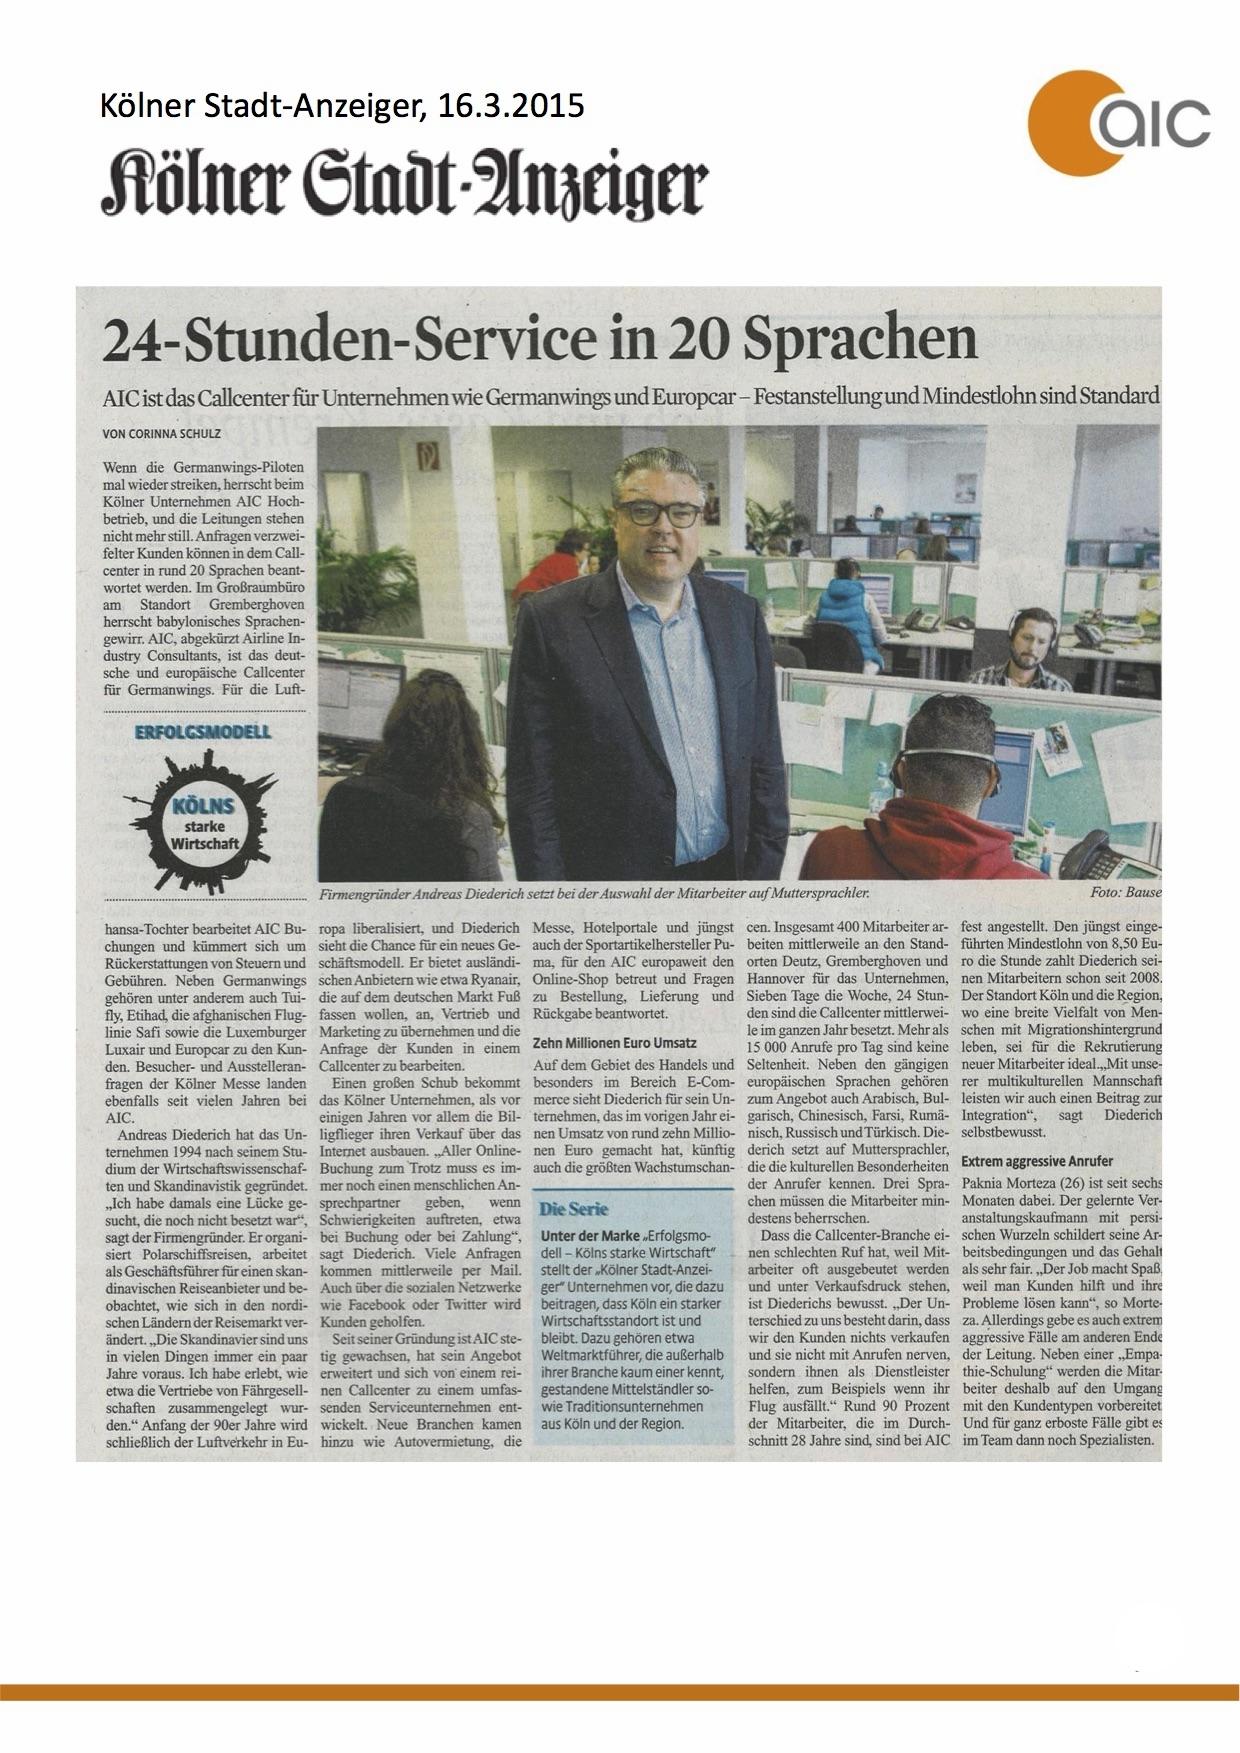 aic pressespiegel 5.jpg